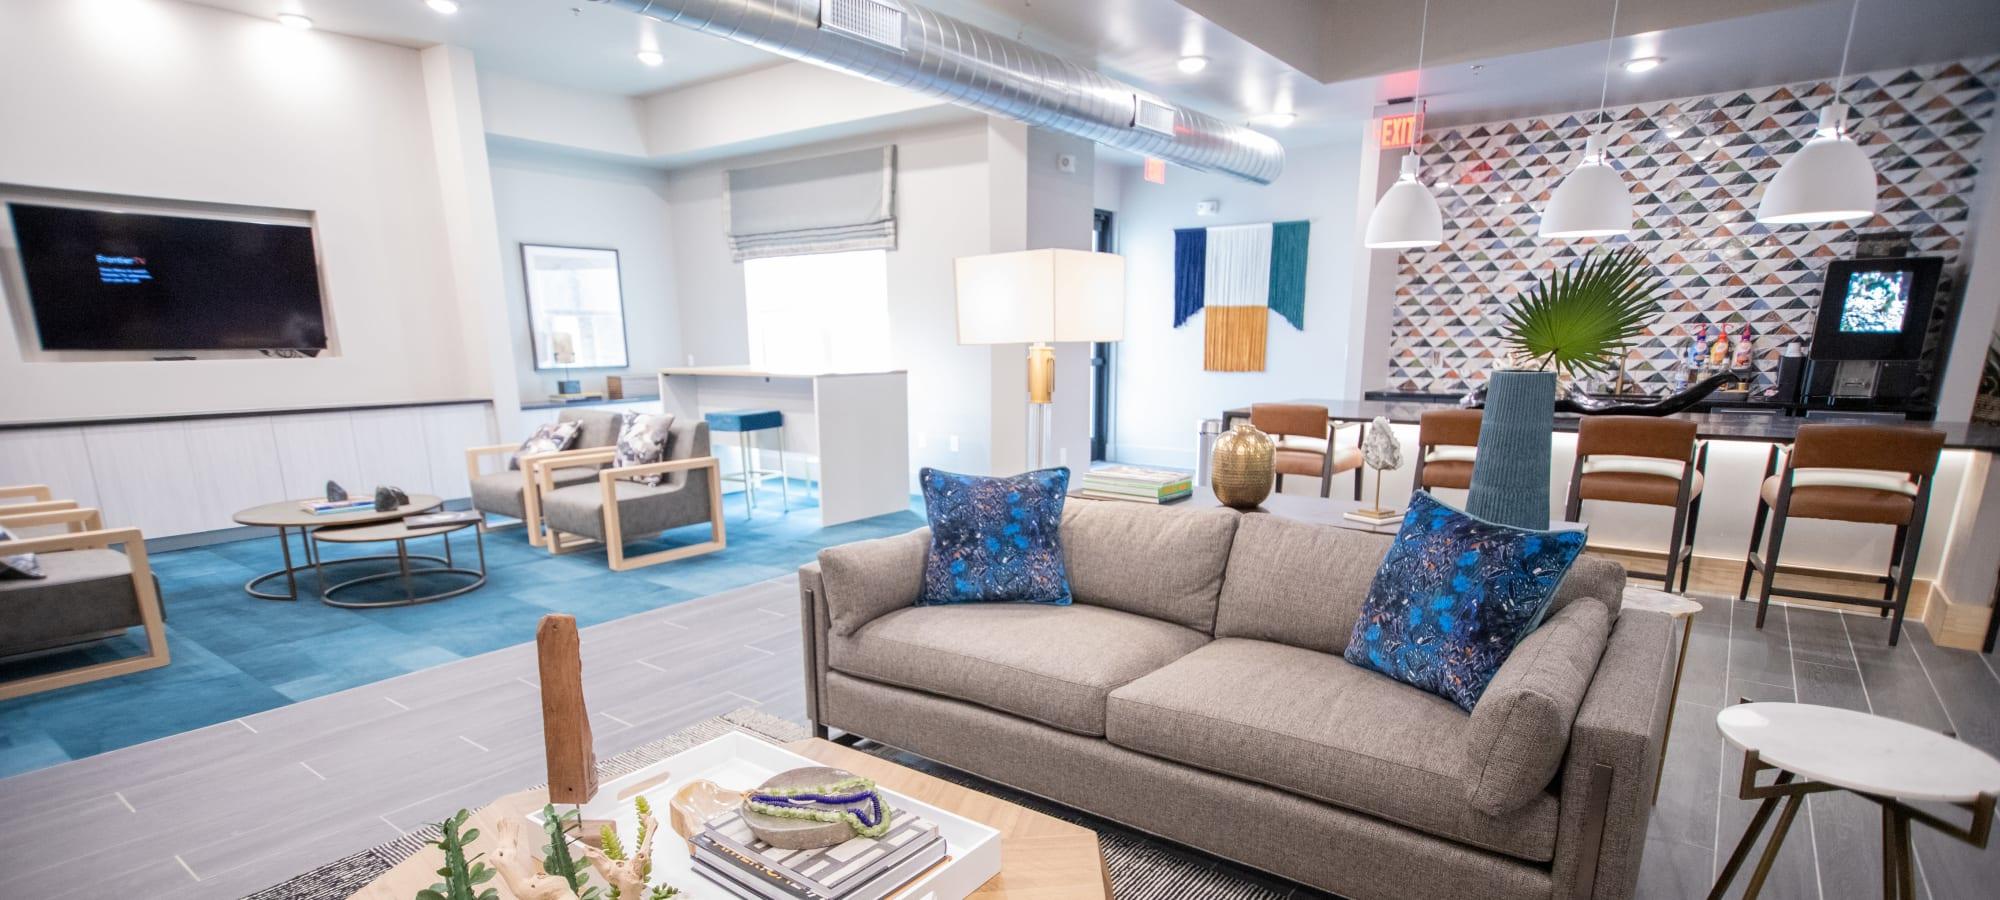 Eighteen51 Brinker apartments in Denton, Texas